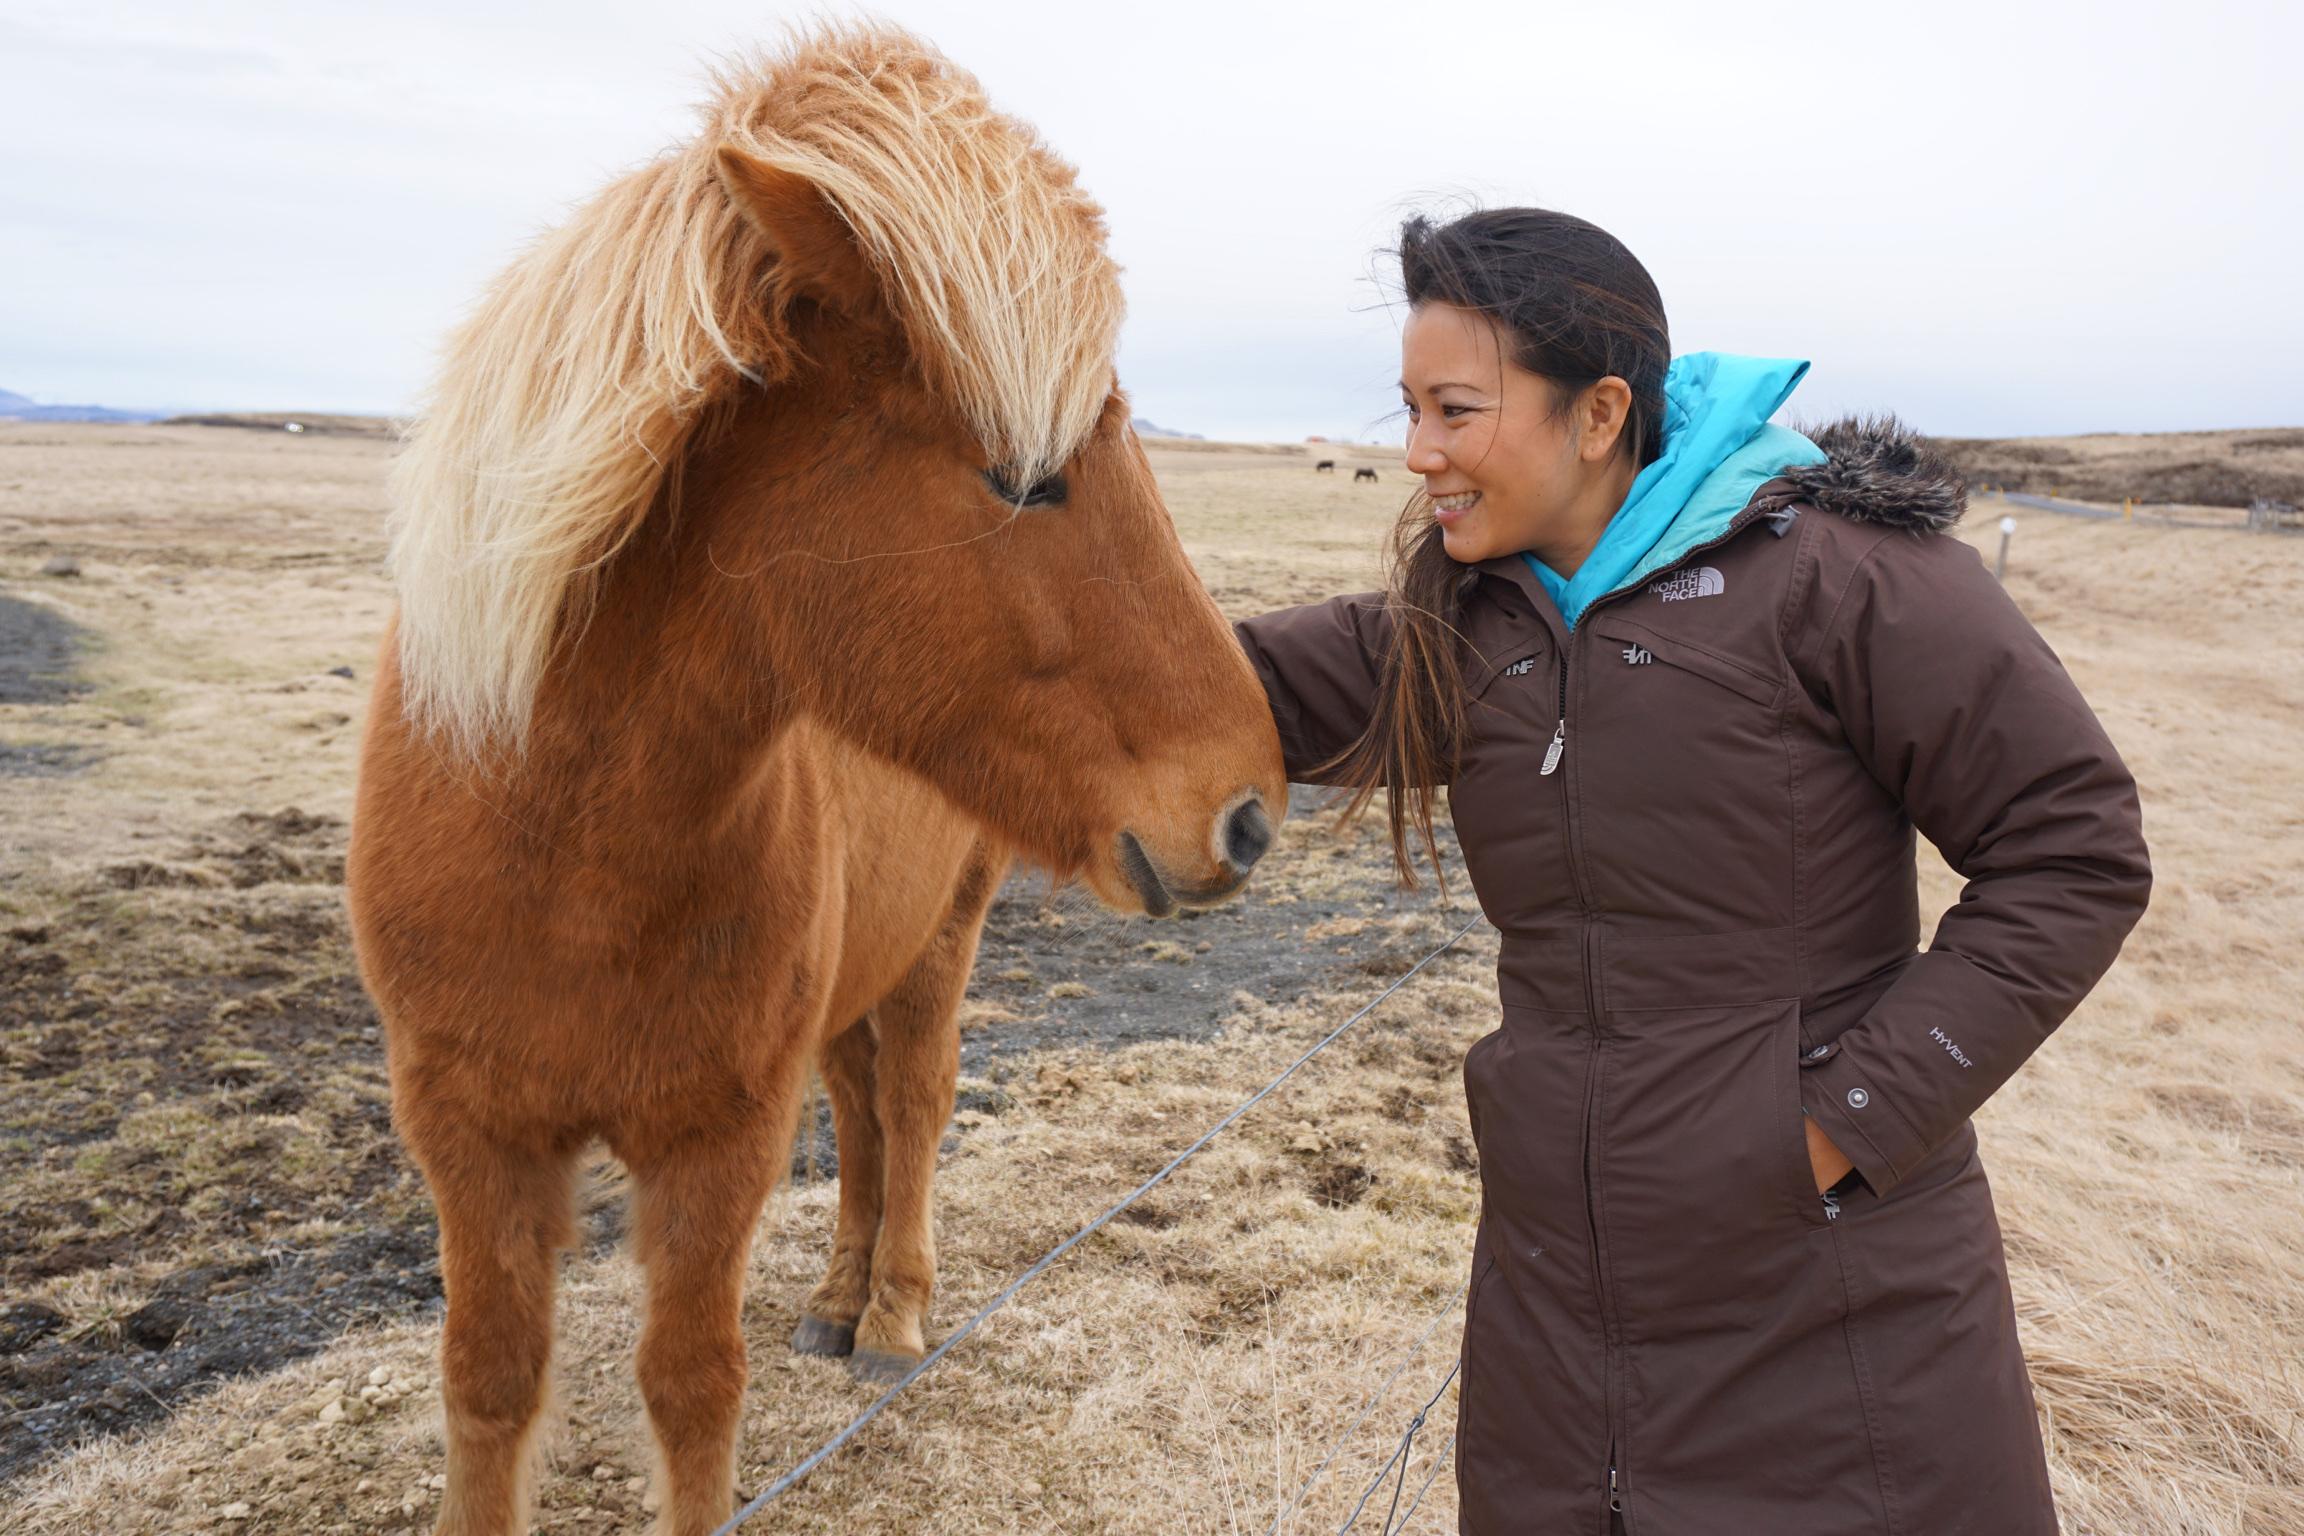 Chasing-the-Northern-Lights-Chasing-A-Sun-Angela-Sun-Icelandic-Ponies-1.JPG